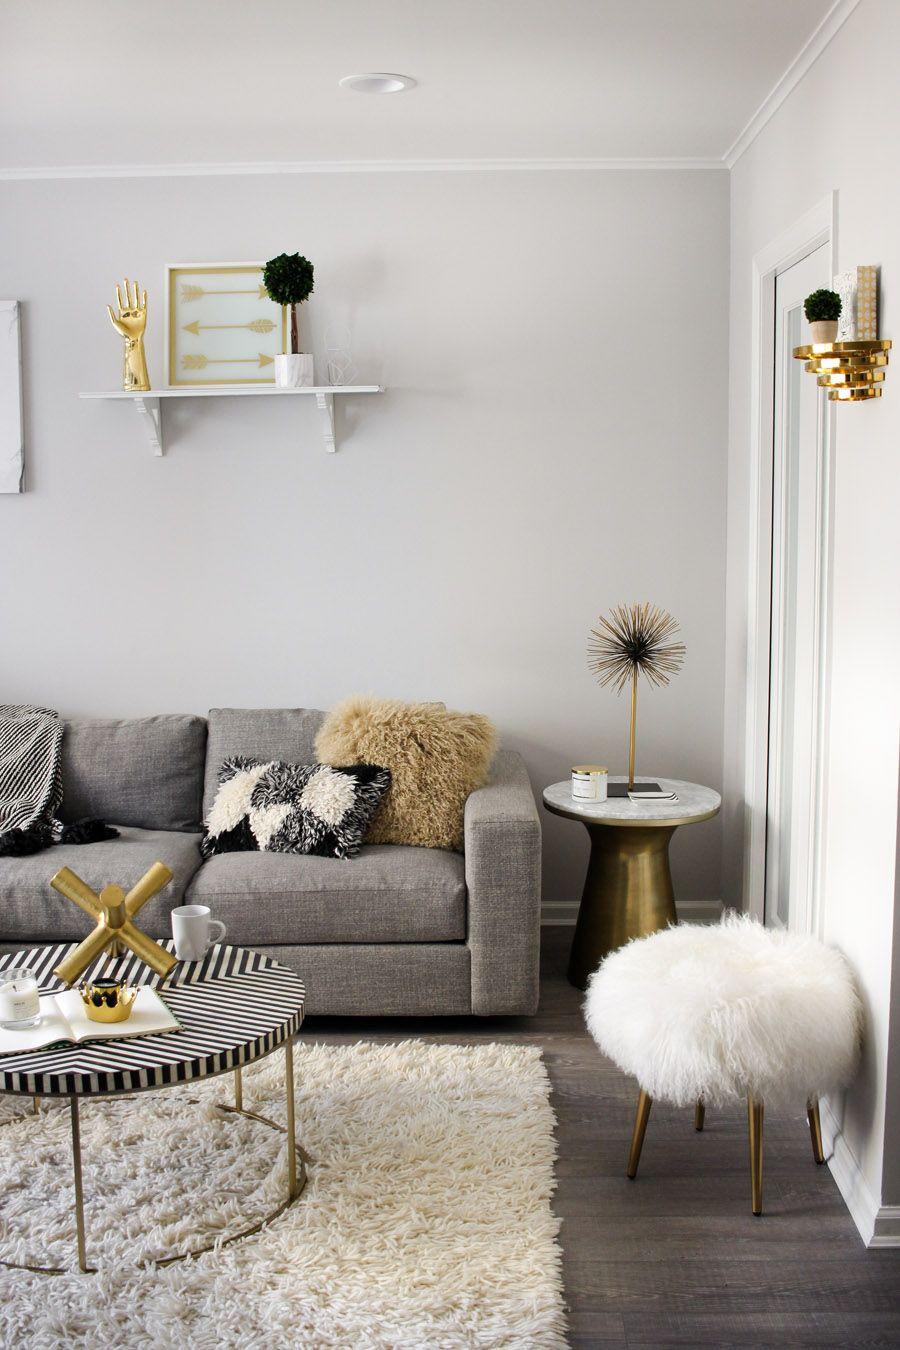 Steffy Kuncman' Monochrome Modern Living Room Interiors